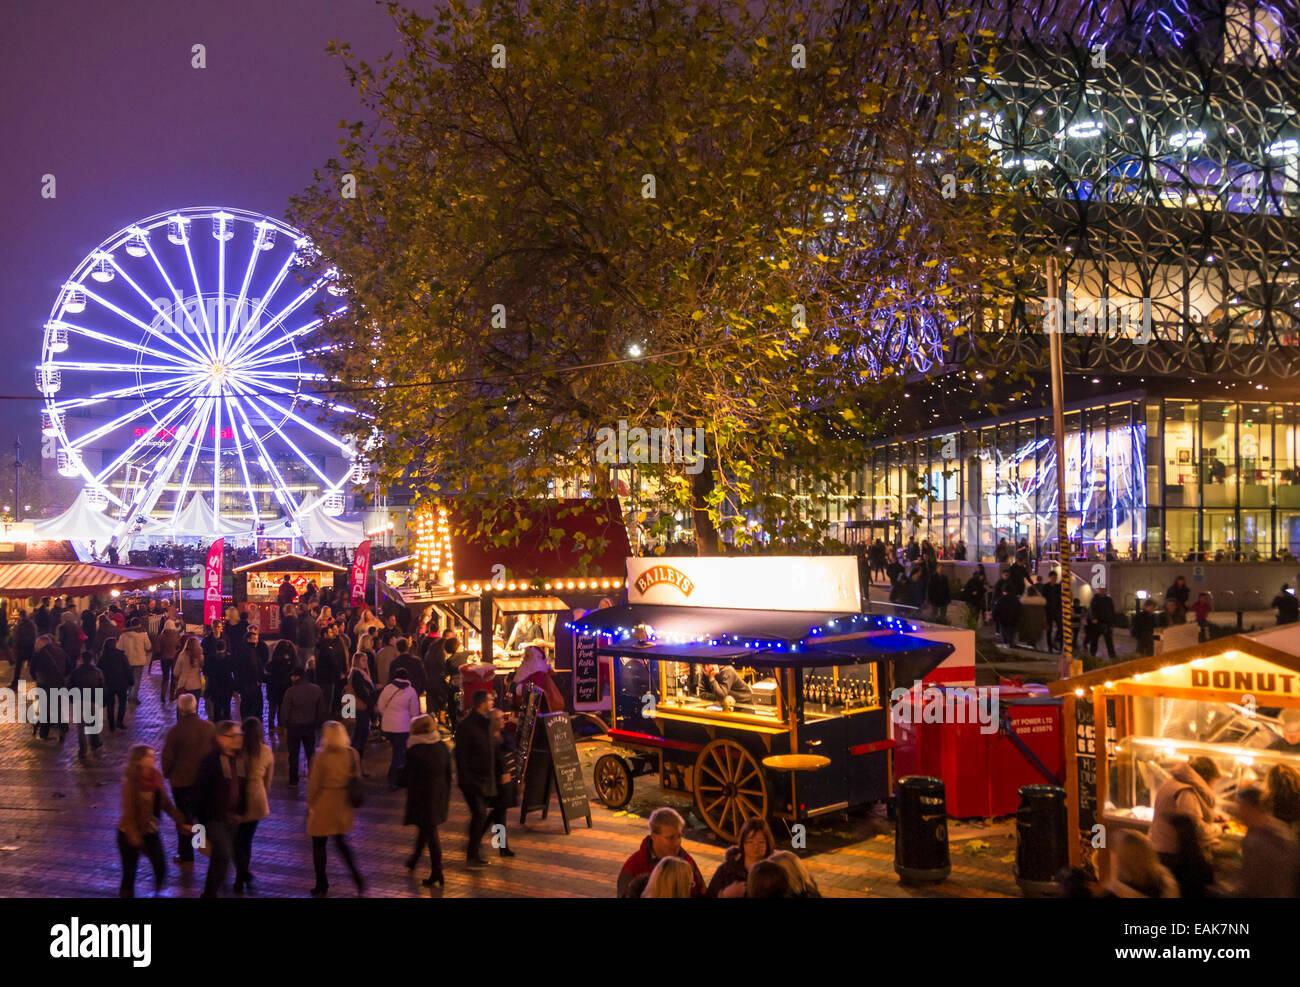 Birmingham Centenary square with big wheel and christmas market stalls West Midlands England UK GB Europe - Stock Image